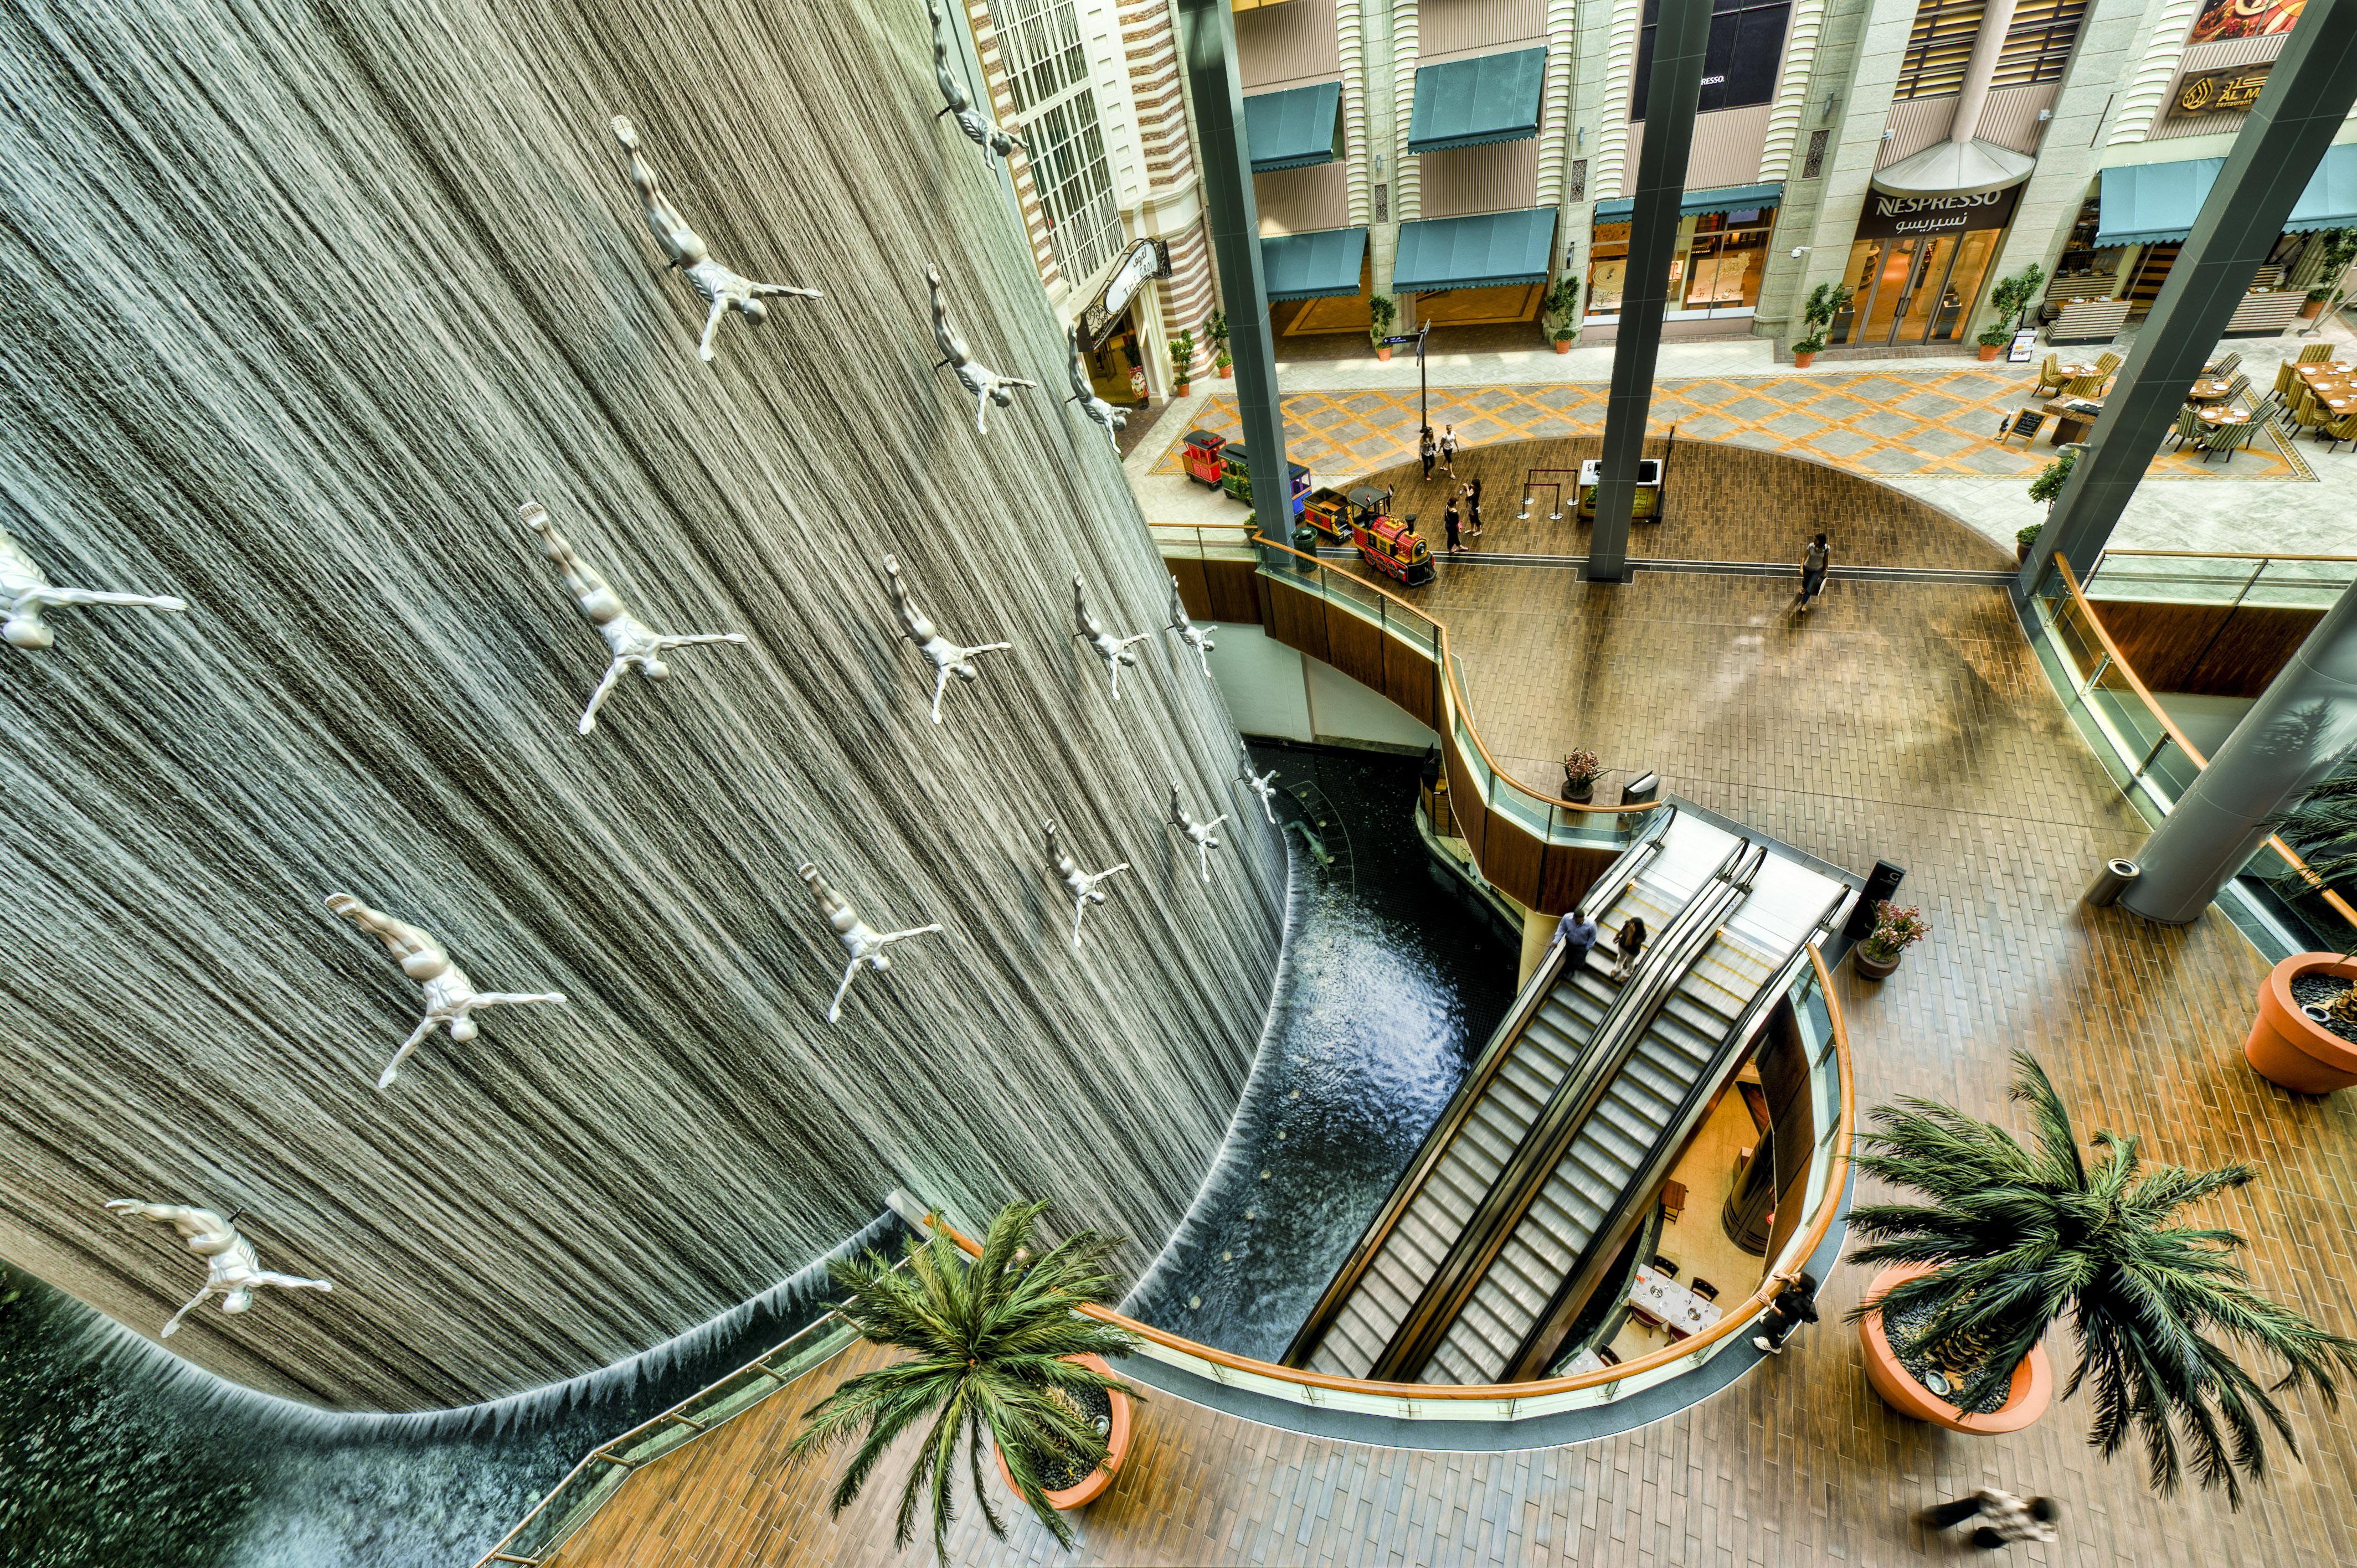 Dubai Mall - Waterfall